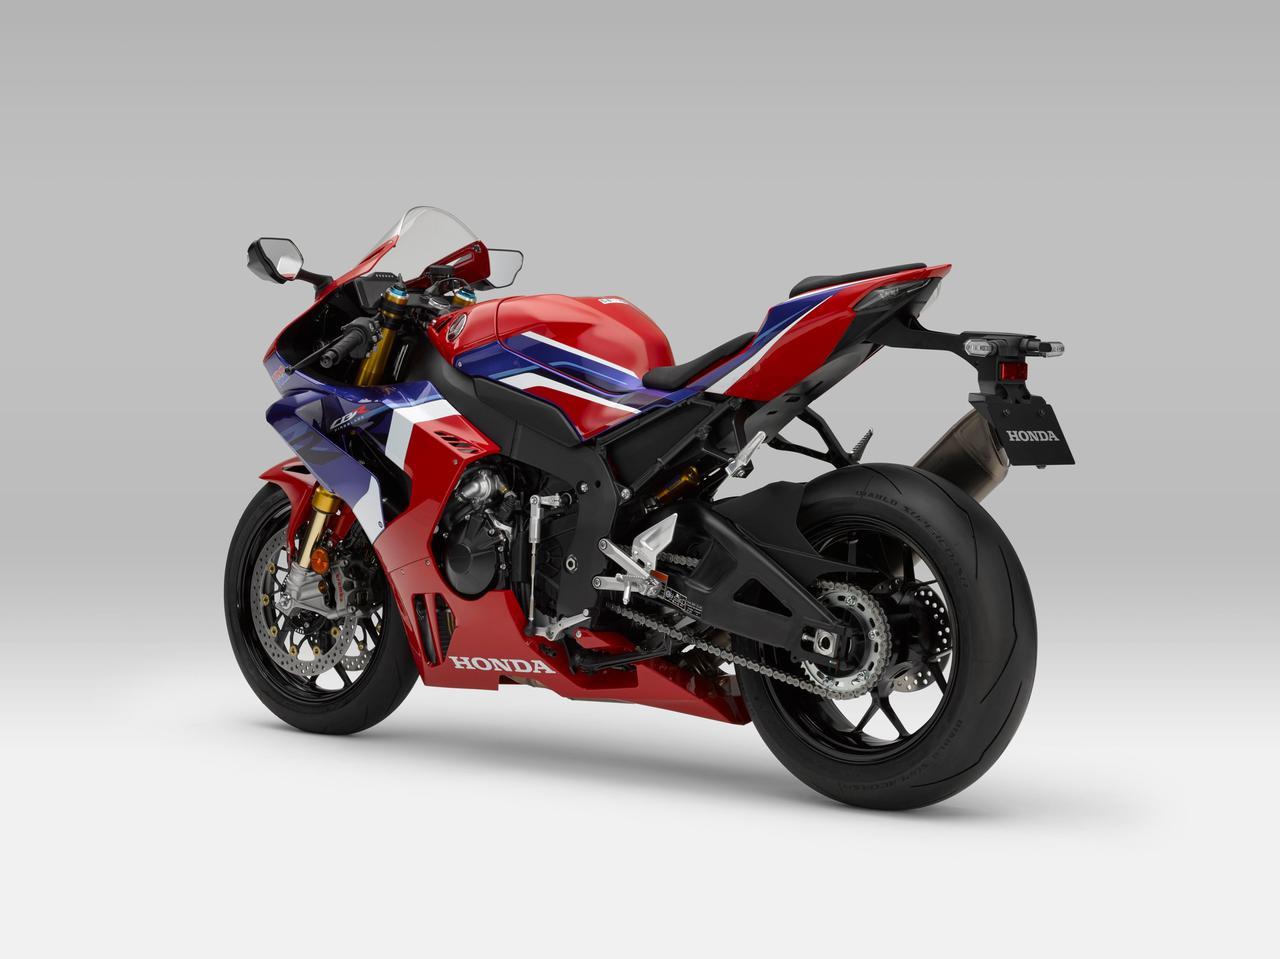 Images : 4番目の画像 - HONDA CBR1000RR-R FIREBLADE SPの写真をもっと見る! - webオートバイ